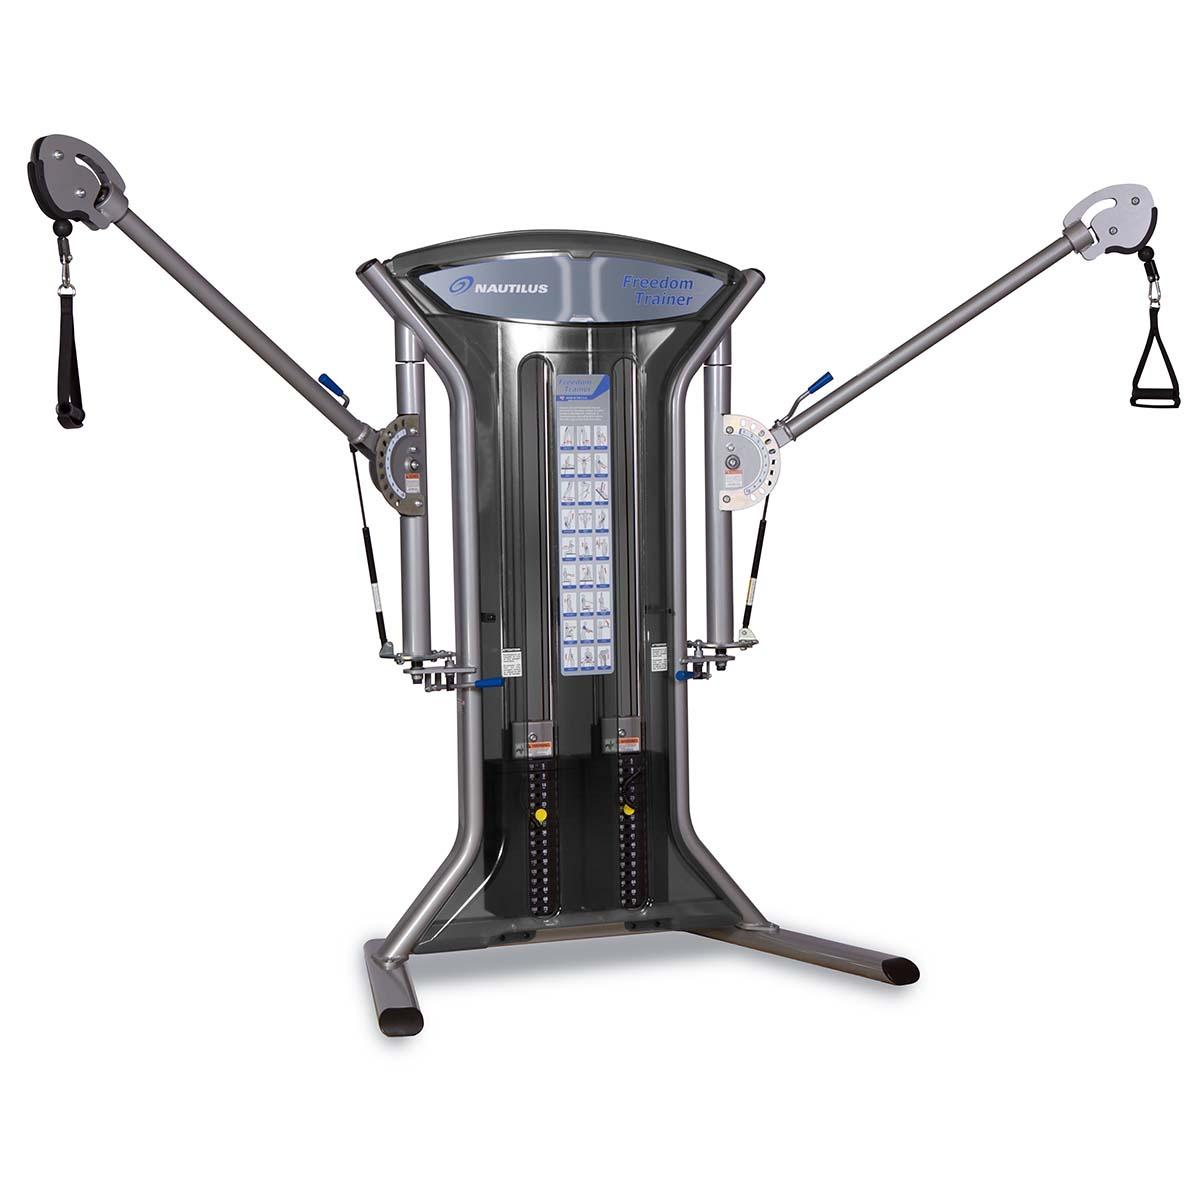 Richmond Strength Equipment - Nautilus Freedom Trainer - Lifestyle Equipment